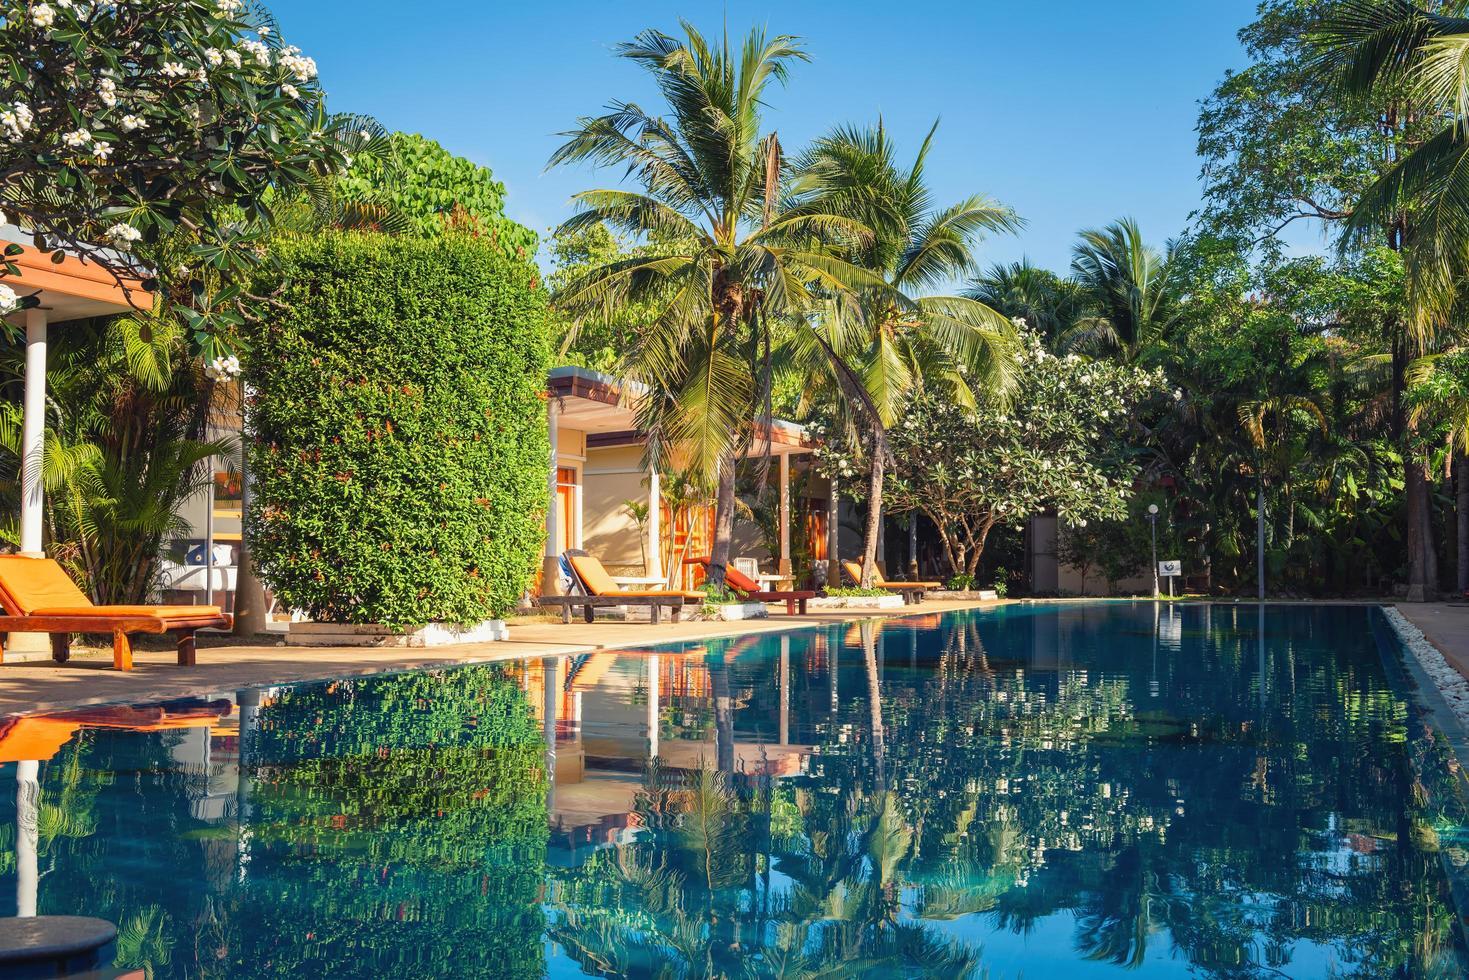 scena della piscina del resort foto